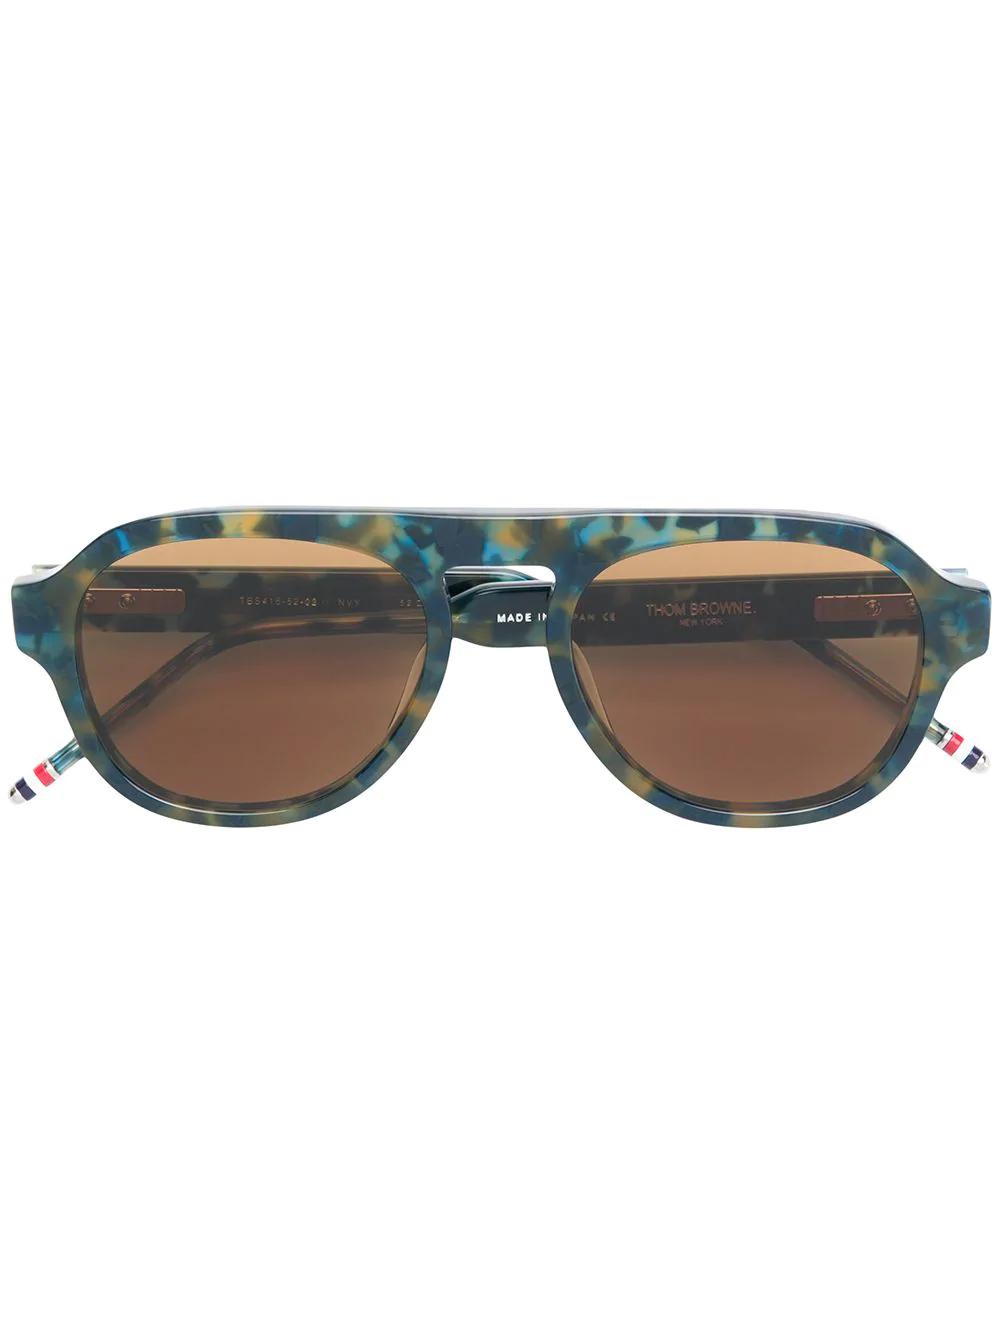 b999c9f76ee5 Thom Browne Eyewear Aviator Sunglasses - Blue